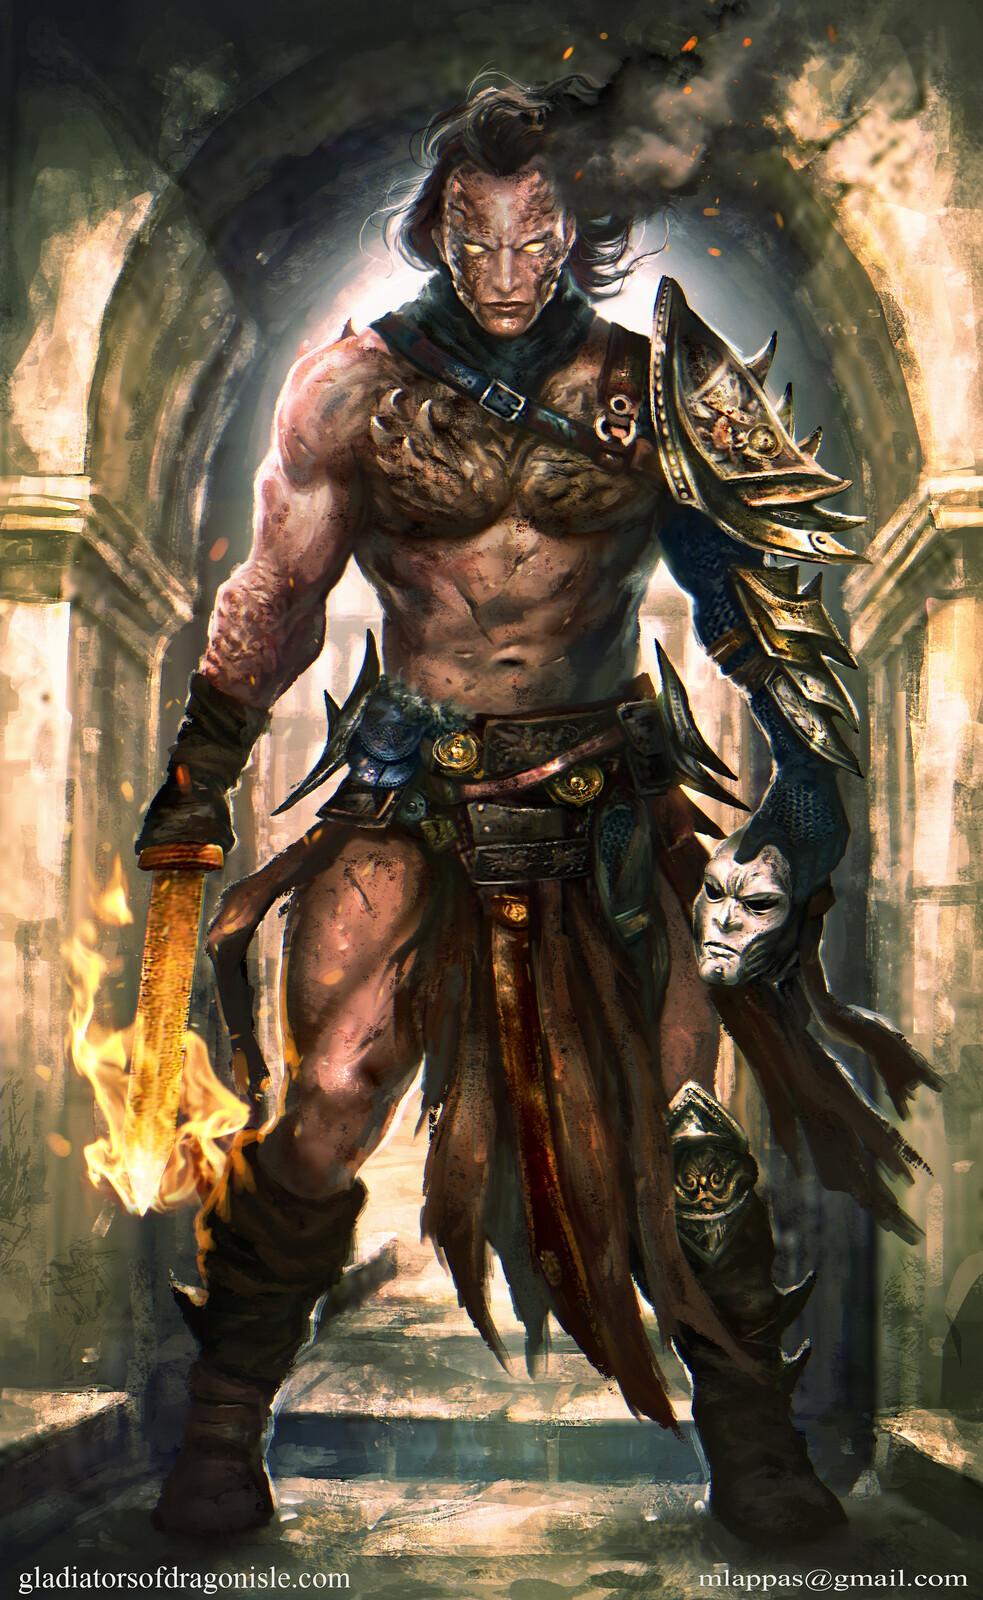 Daze- Gladiators of Dragon Isle